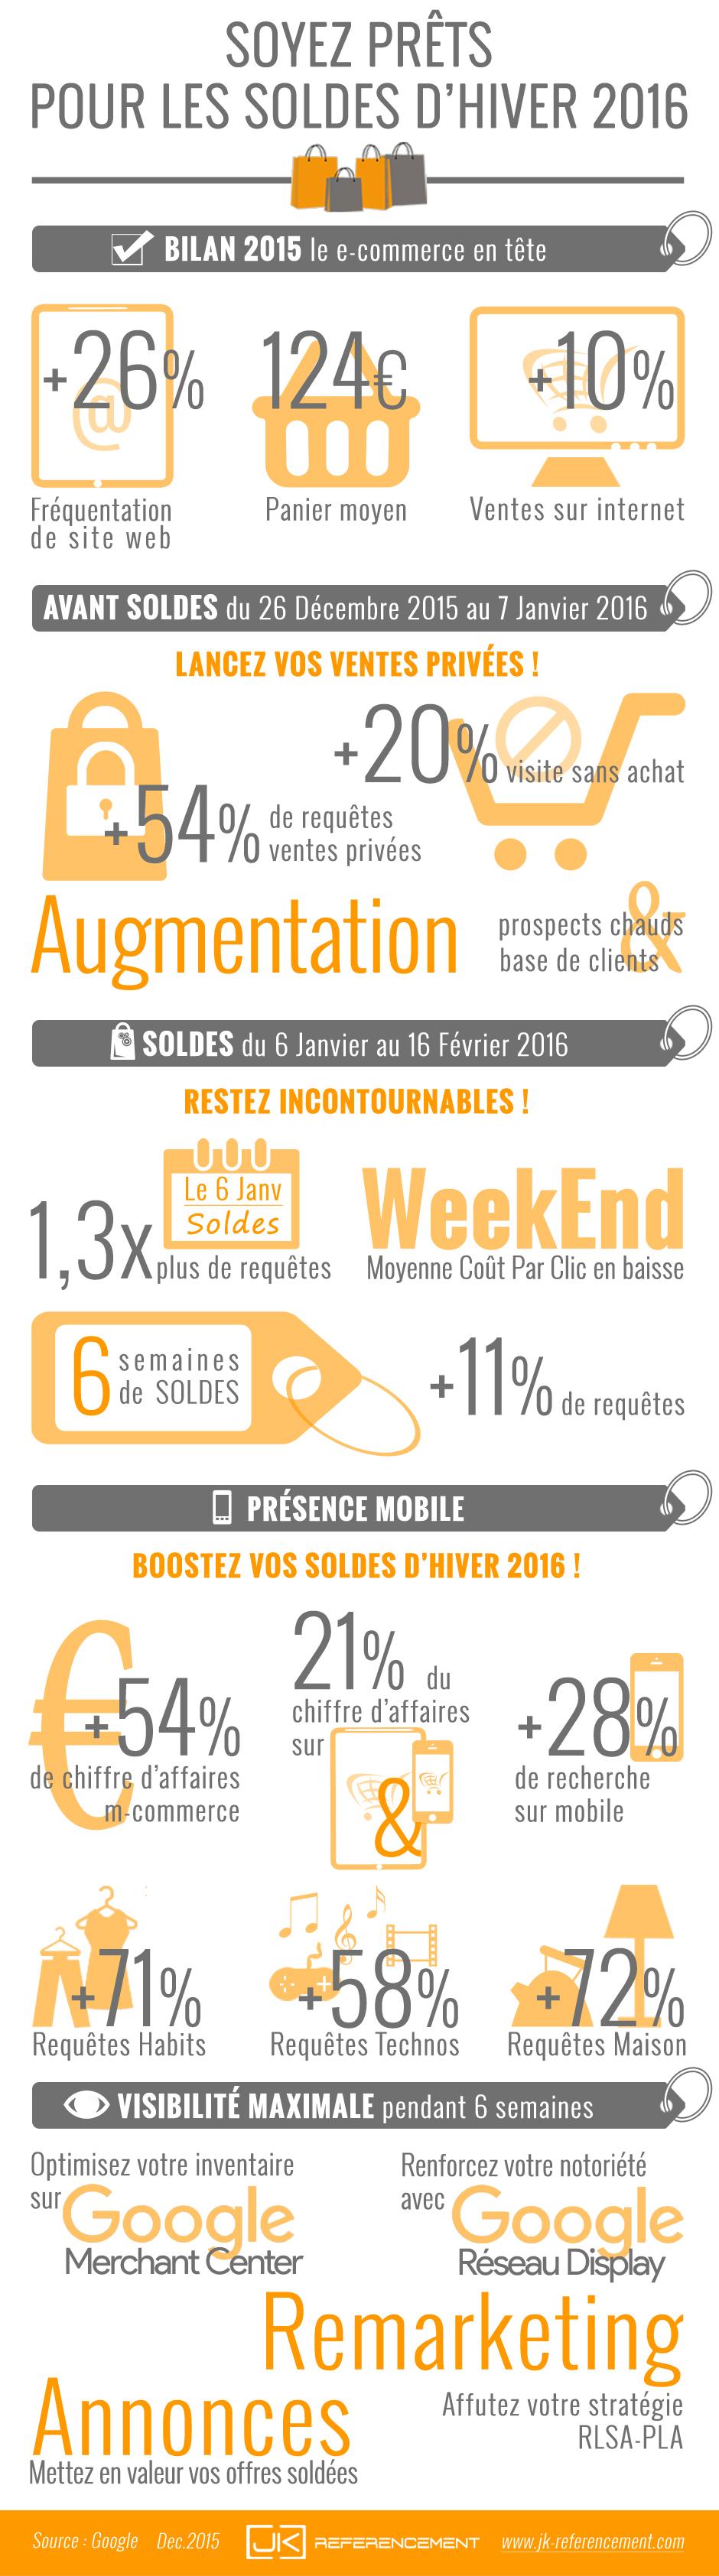 infographie-soldes-hiver-2015